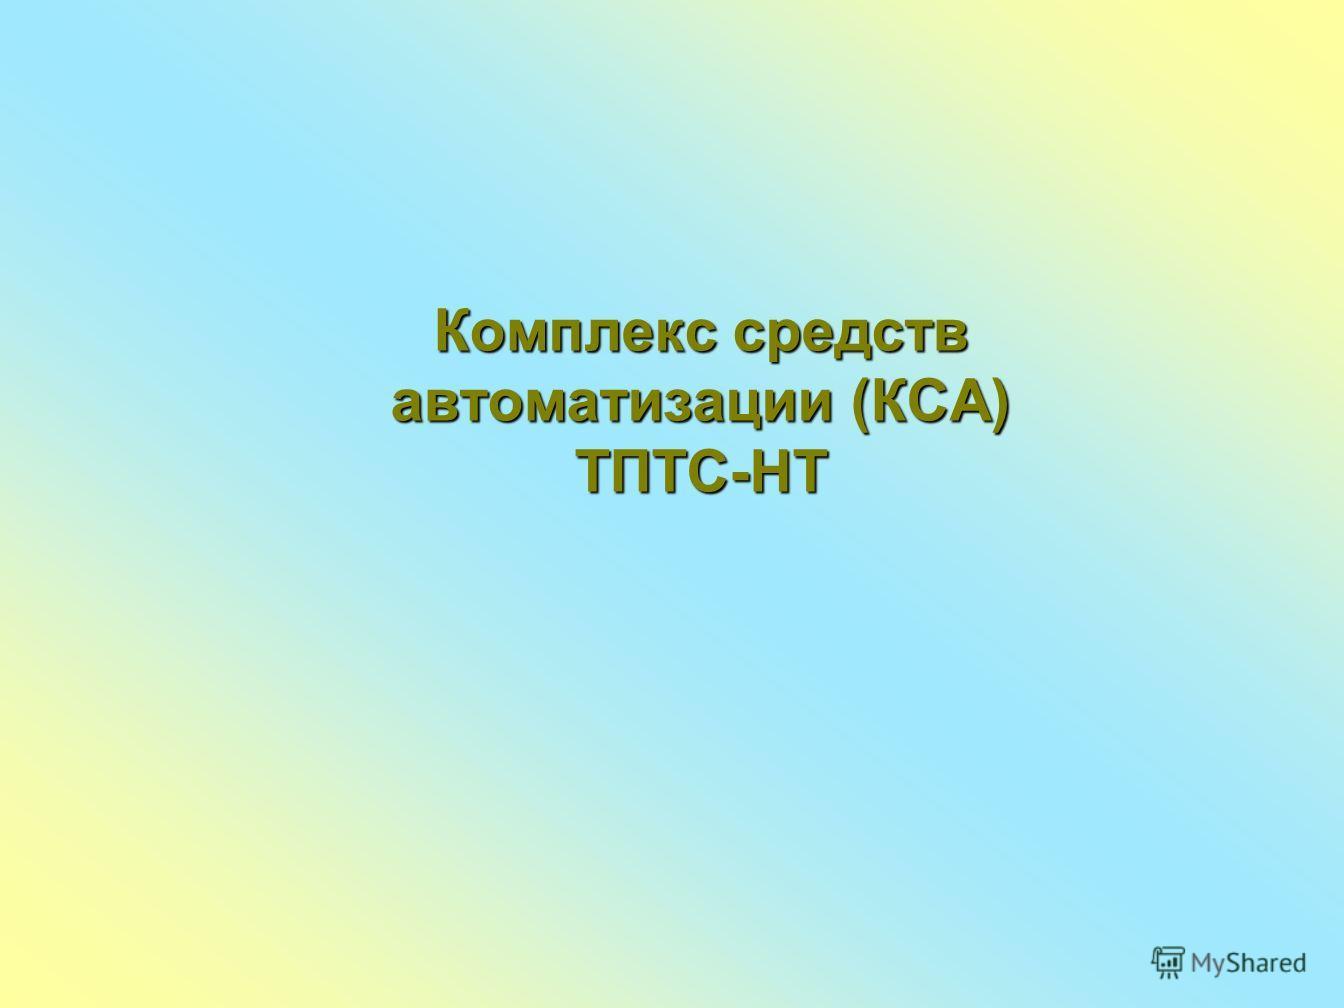 Комплекс средств автоматизации (КСА) ТПТС-НТ